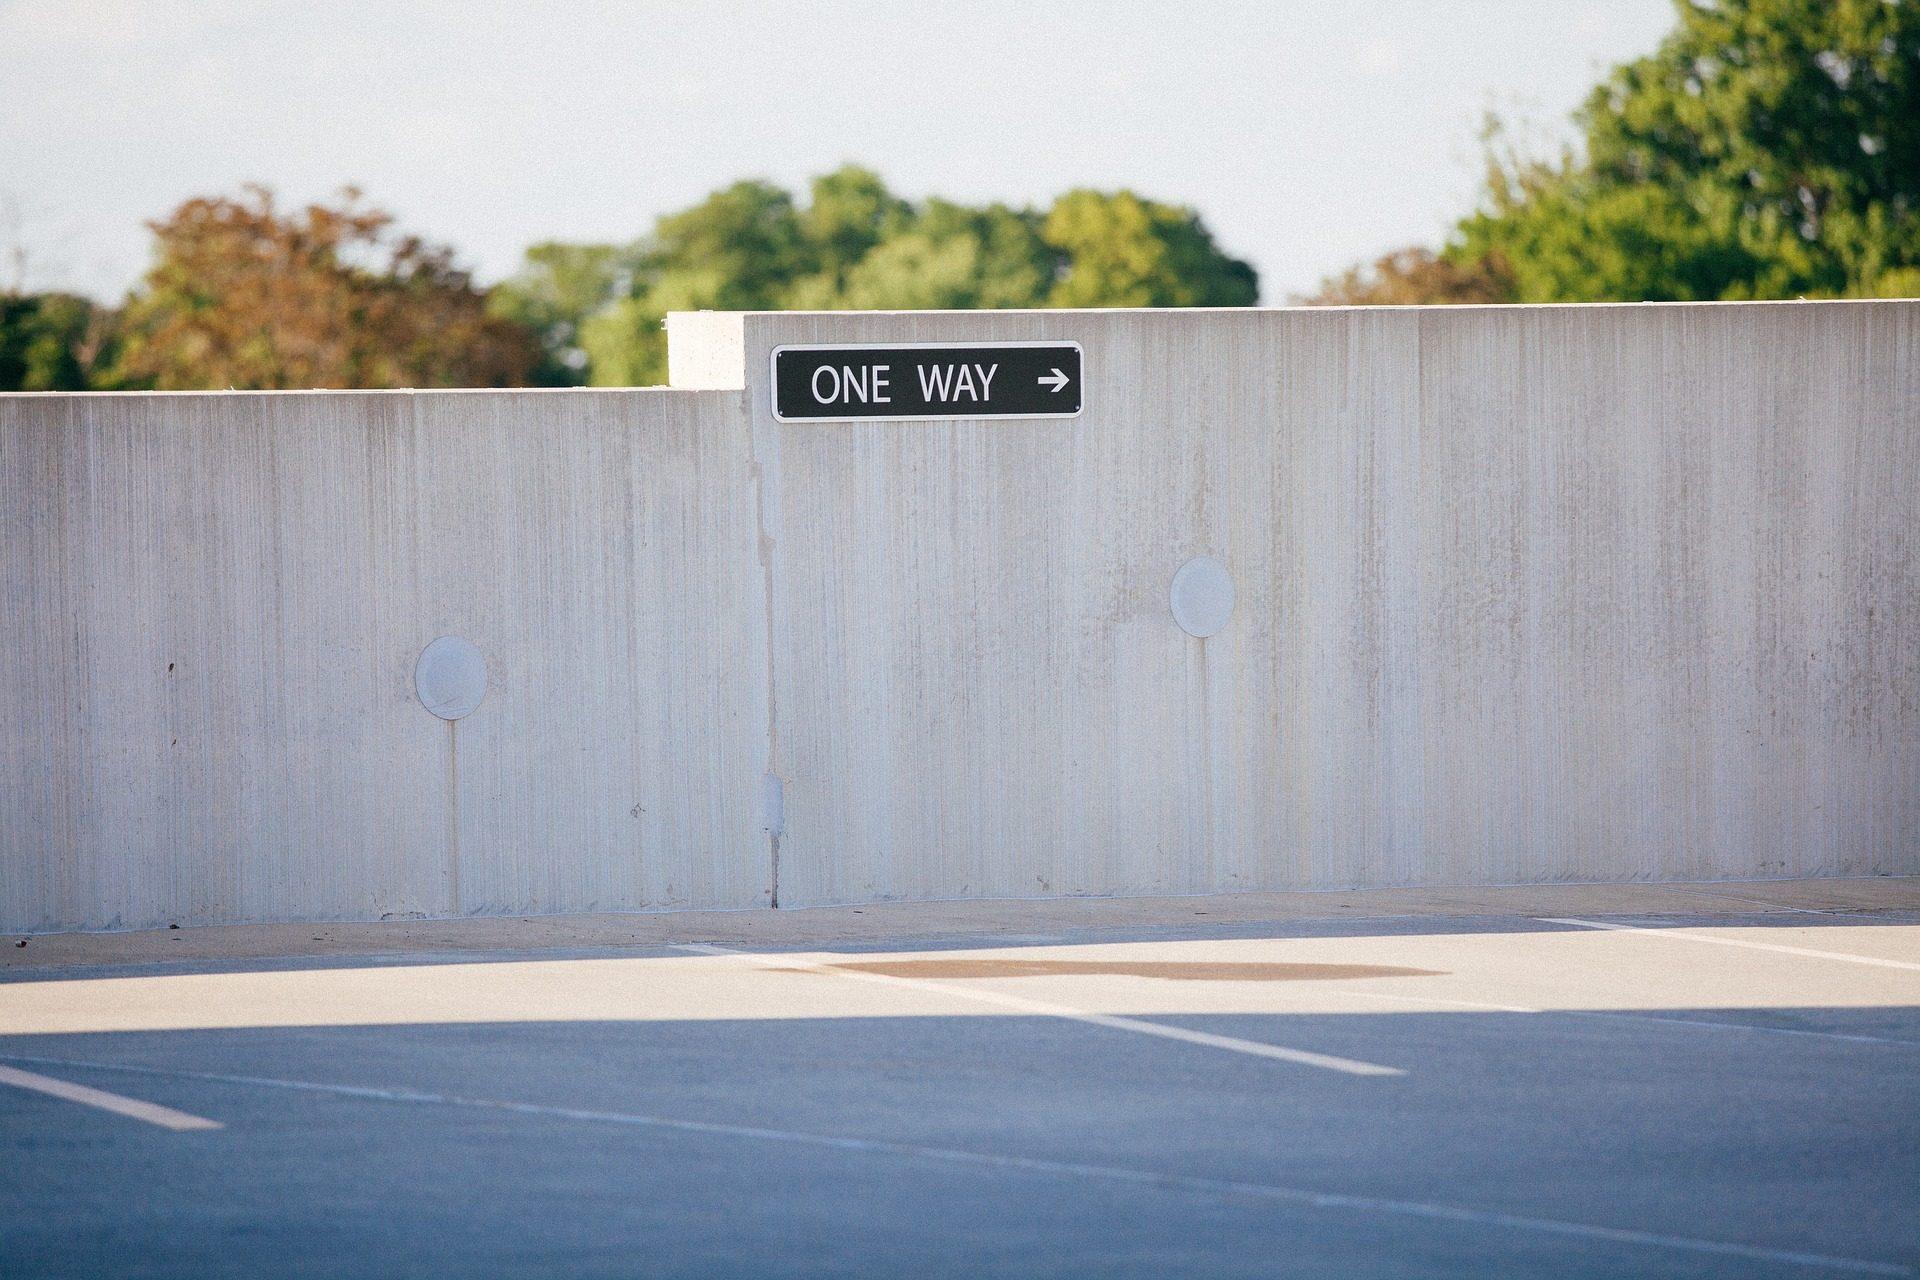 Улица, muro, Стена, Плакат, сигнал, Dirección - Обои HD - Профессор falken.com